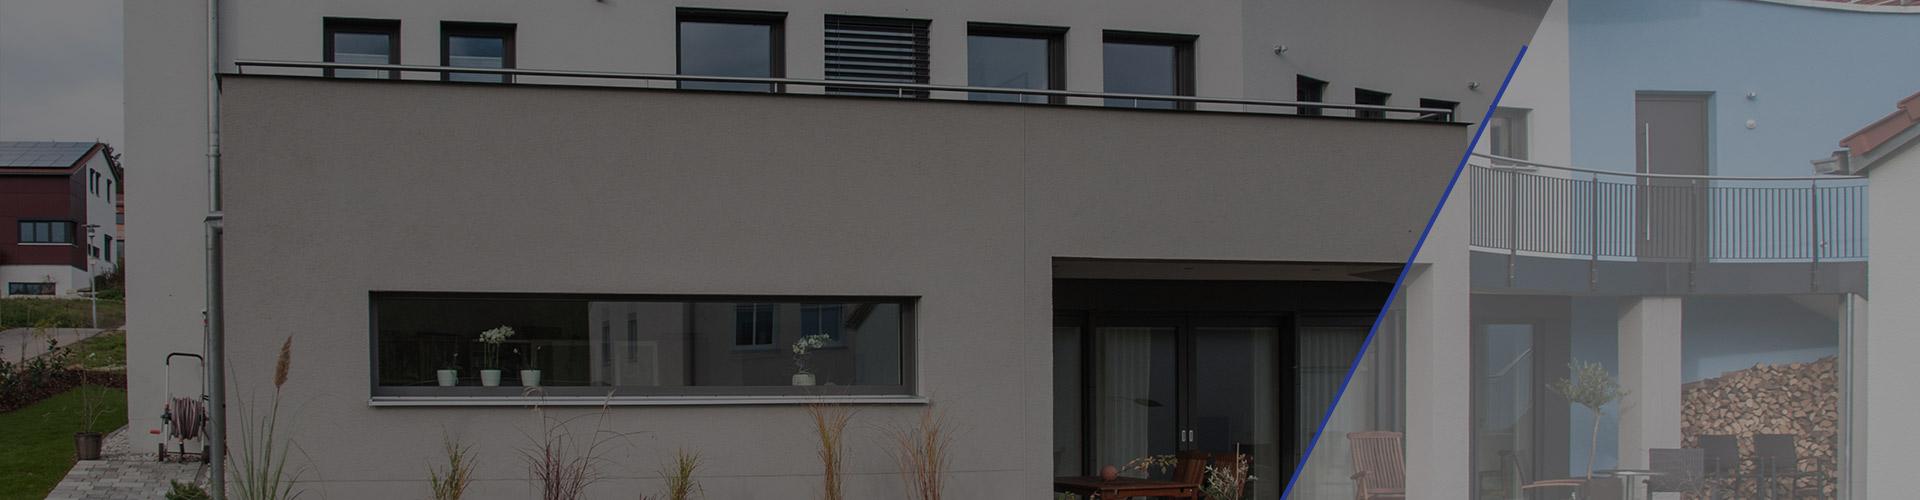 Neubau Architektin Martina Edl Eichstätt